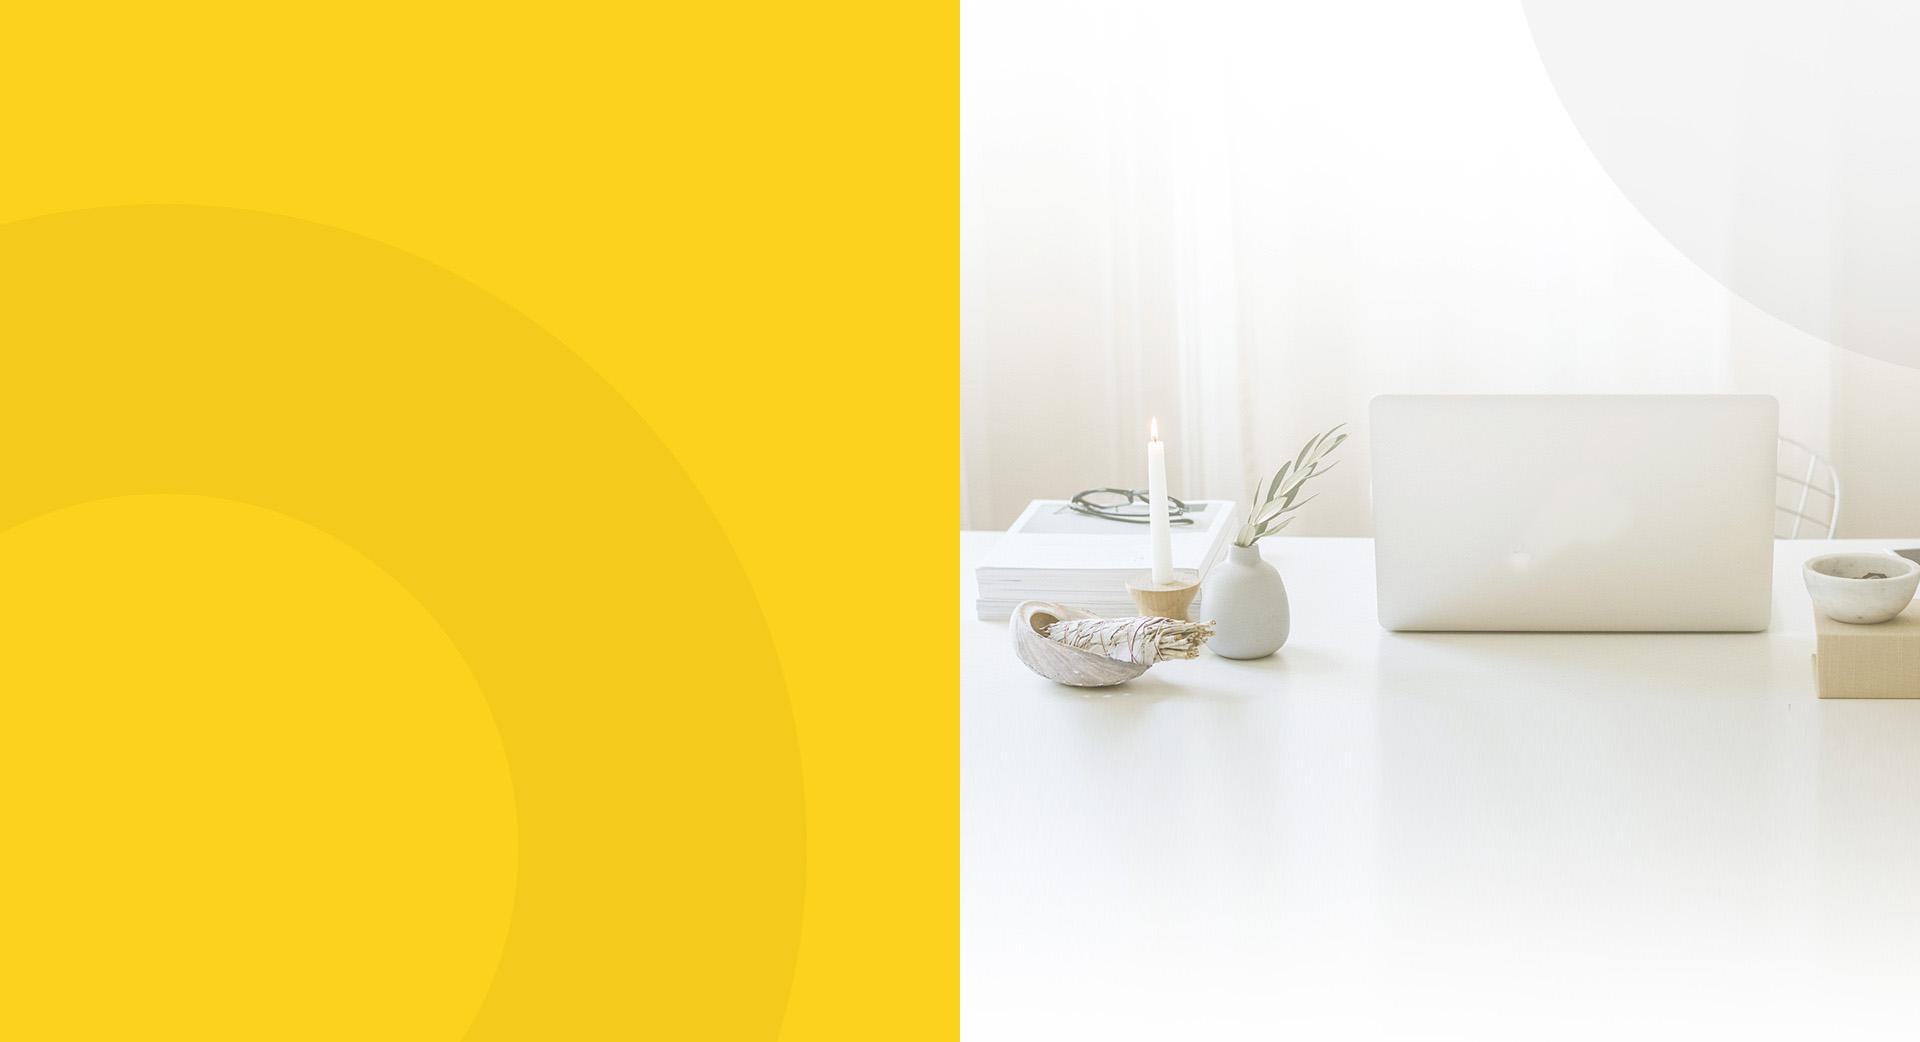 Mirjam-Ehler-me.agentur-social-media-strategie-online-marketing-ketsch-mannheim